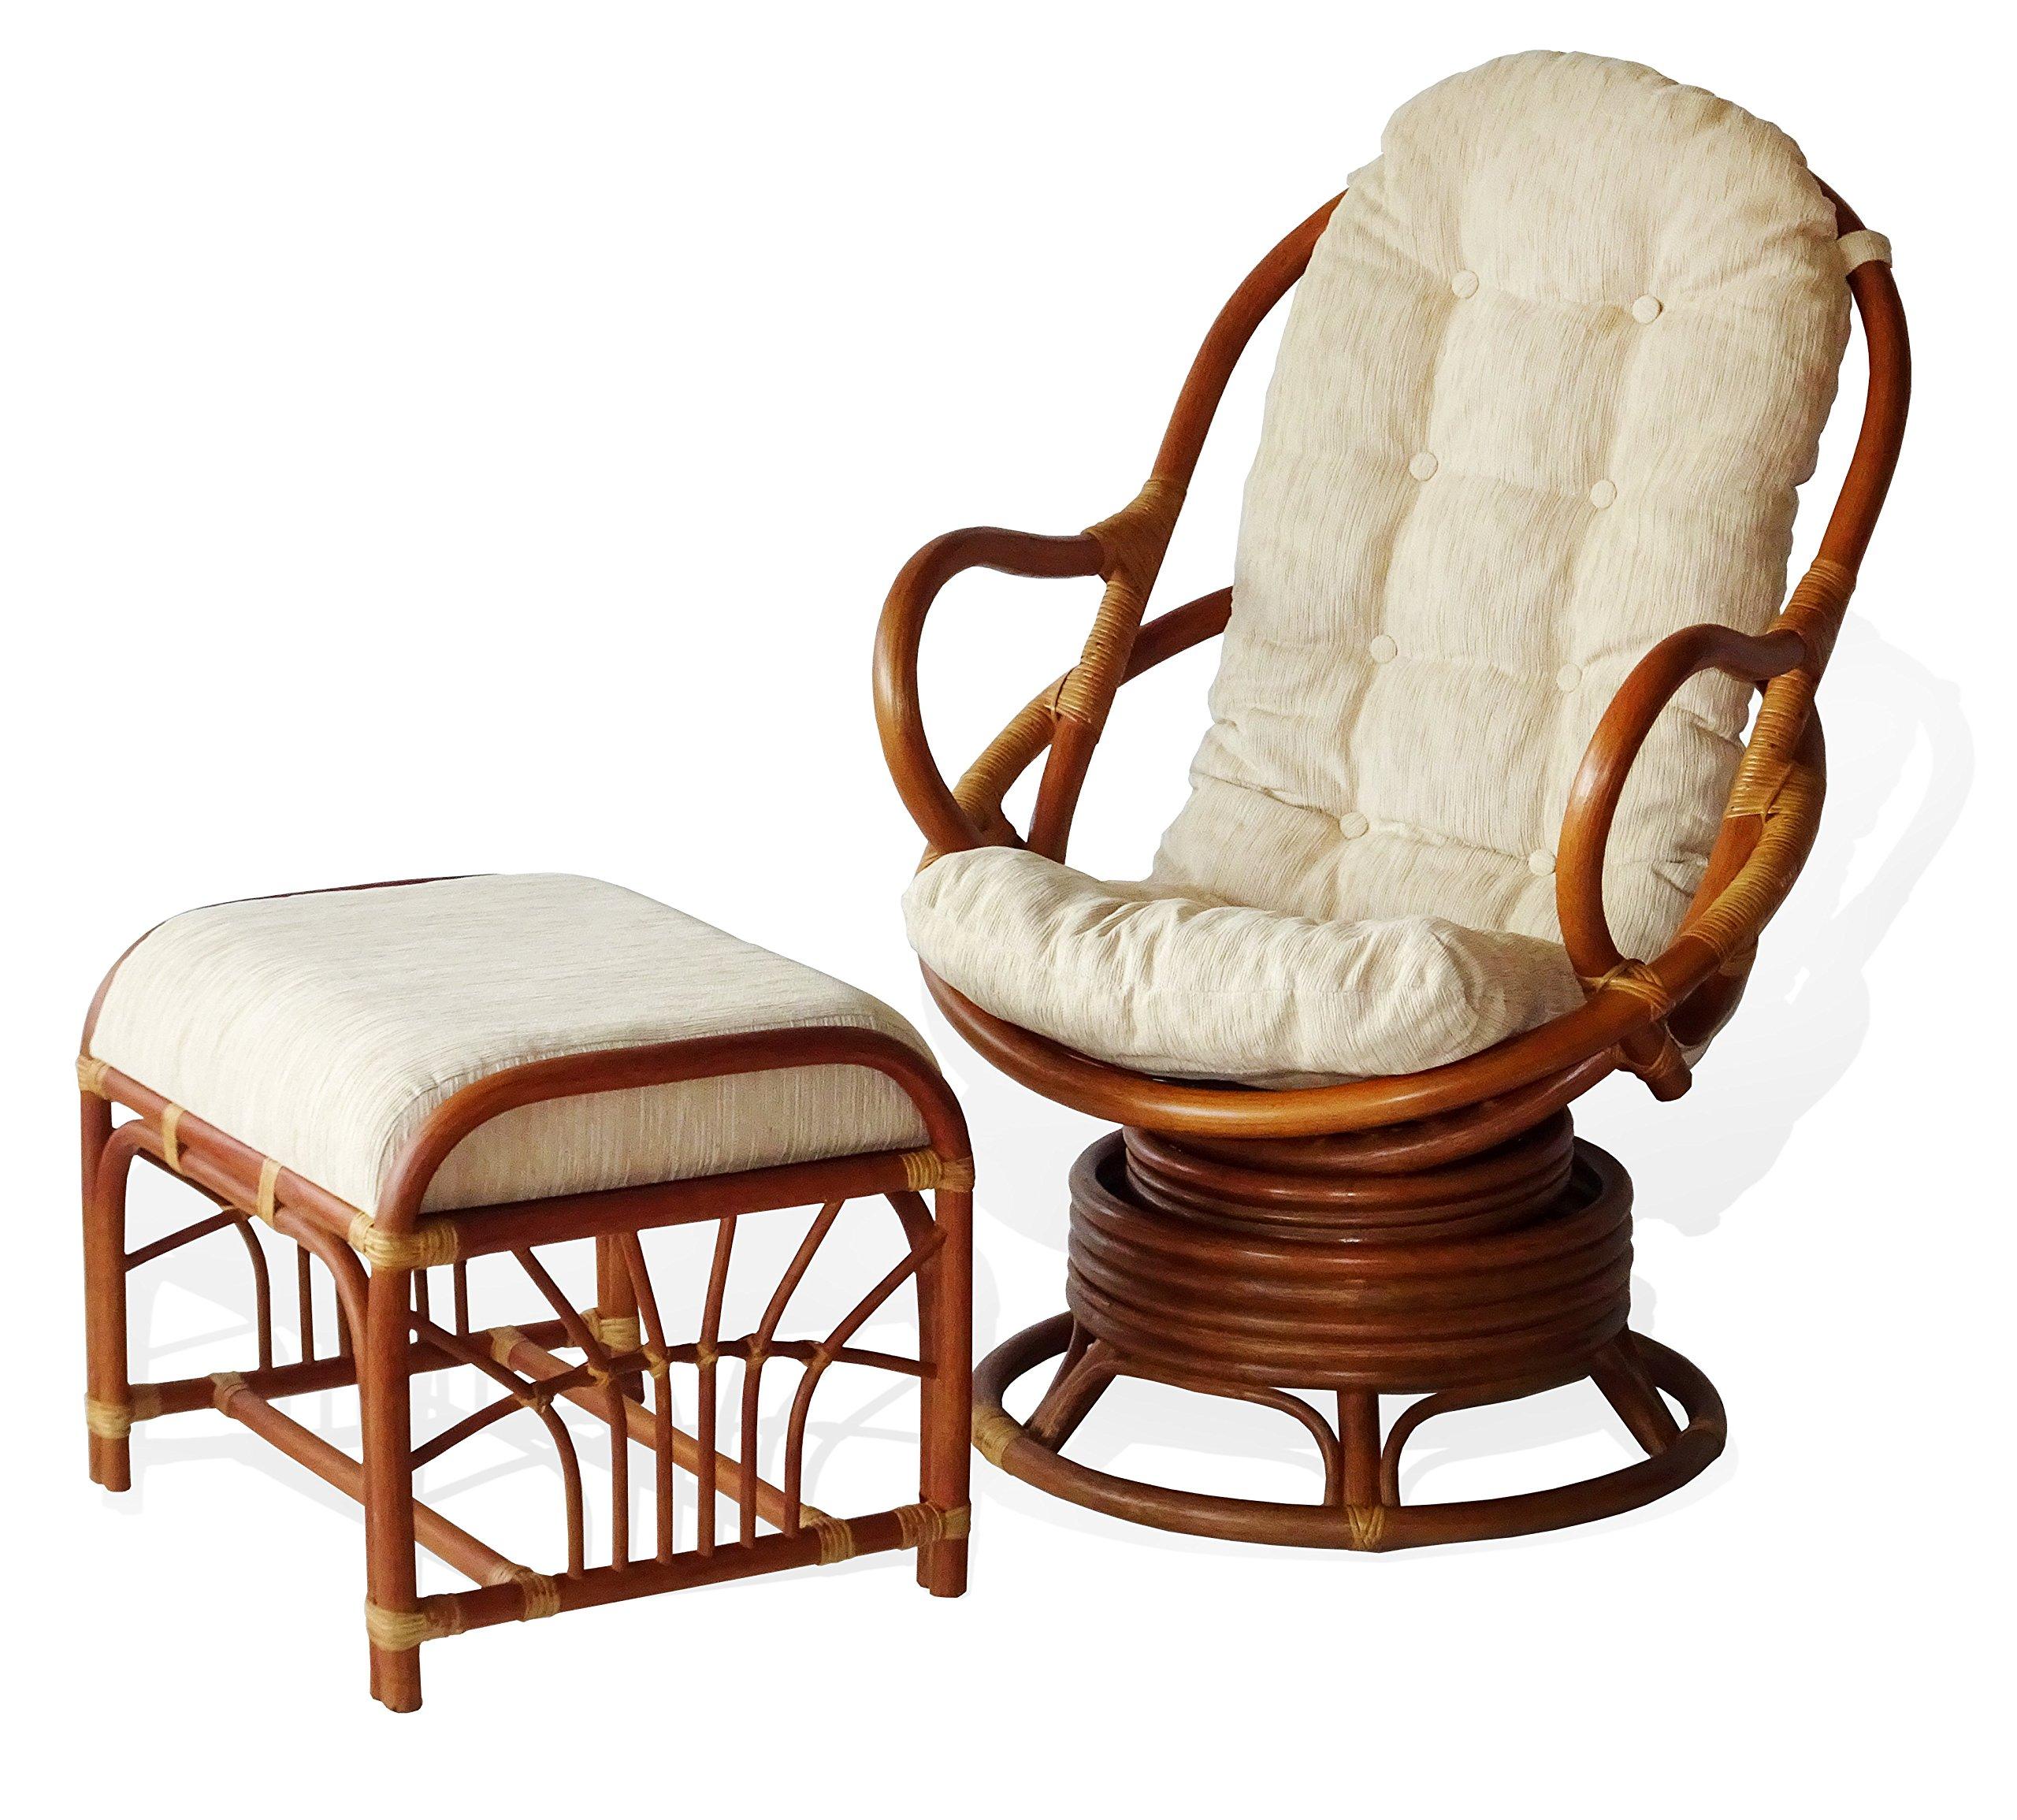 Java Swivel Rocking Rattan Wicker Chair Cream Cushion w/Ottoman, Colonial by Rattan Wicker Furniture